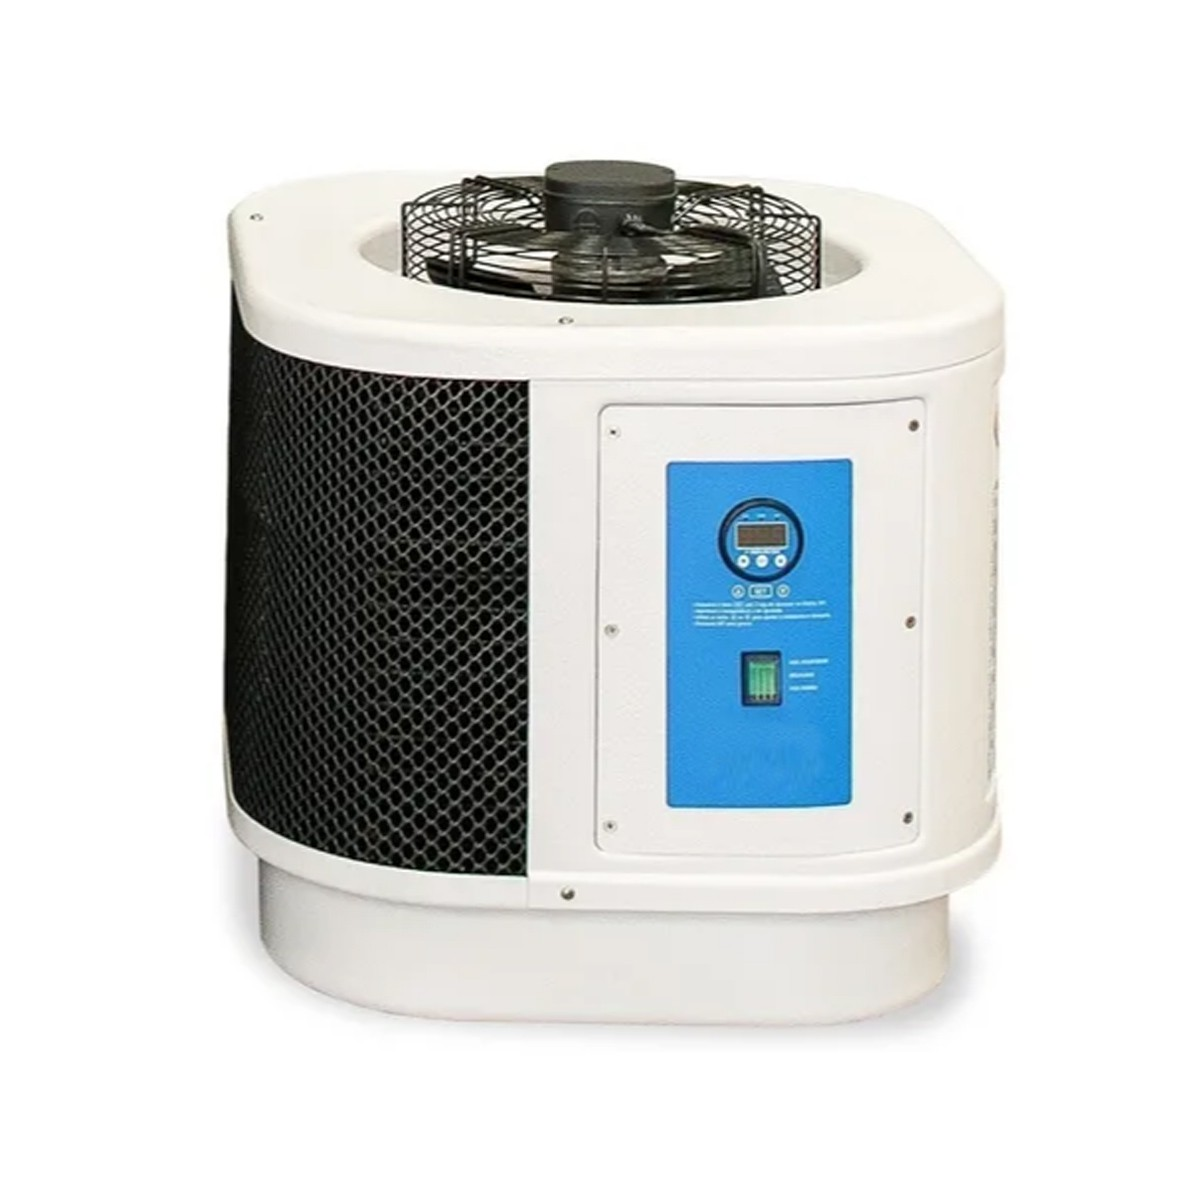 Aquecedor De Piscina Bomba De Calor Ideal Para 15 Mil Litros